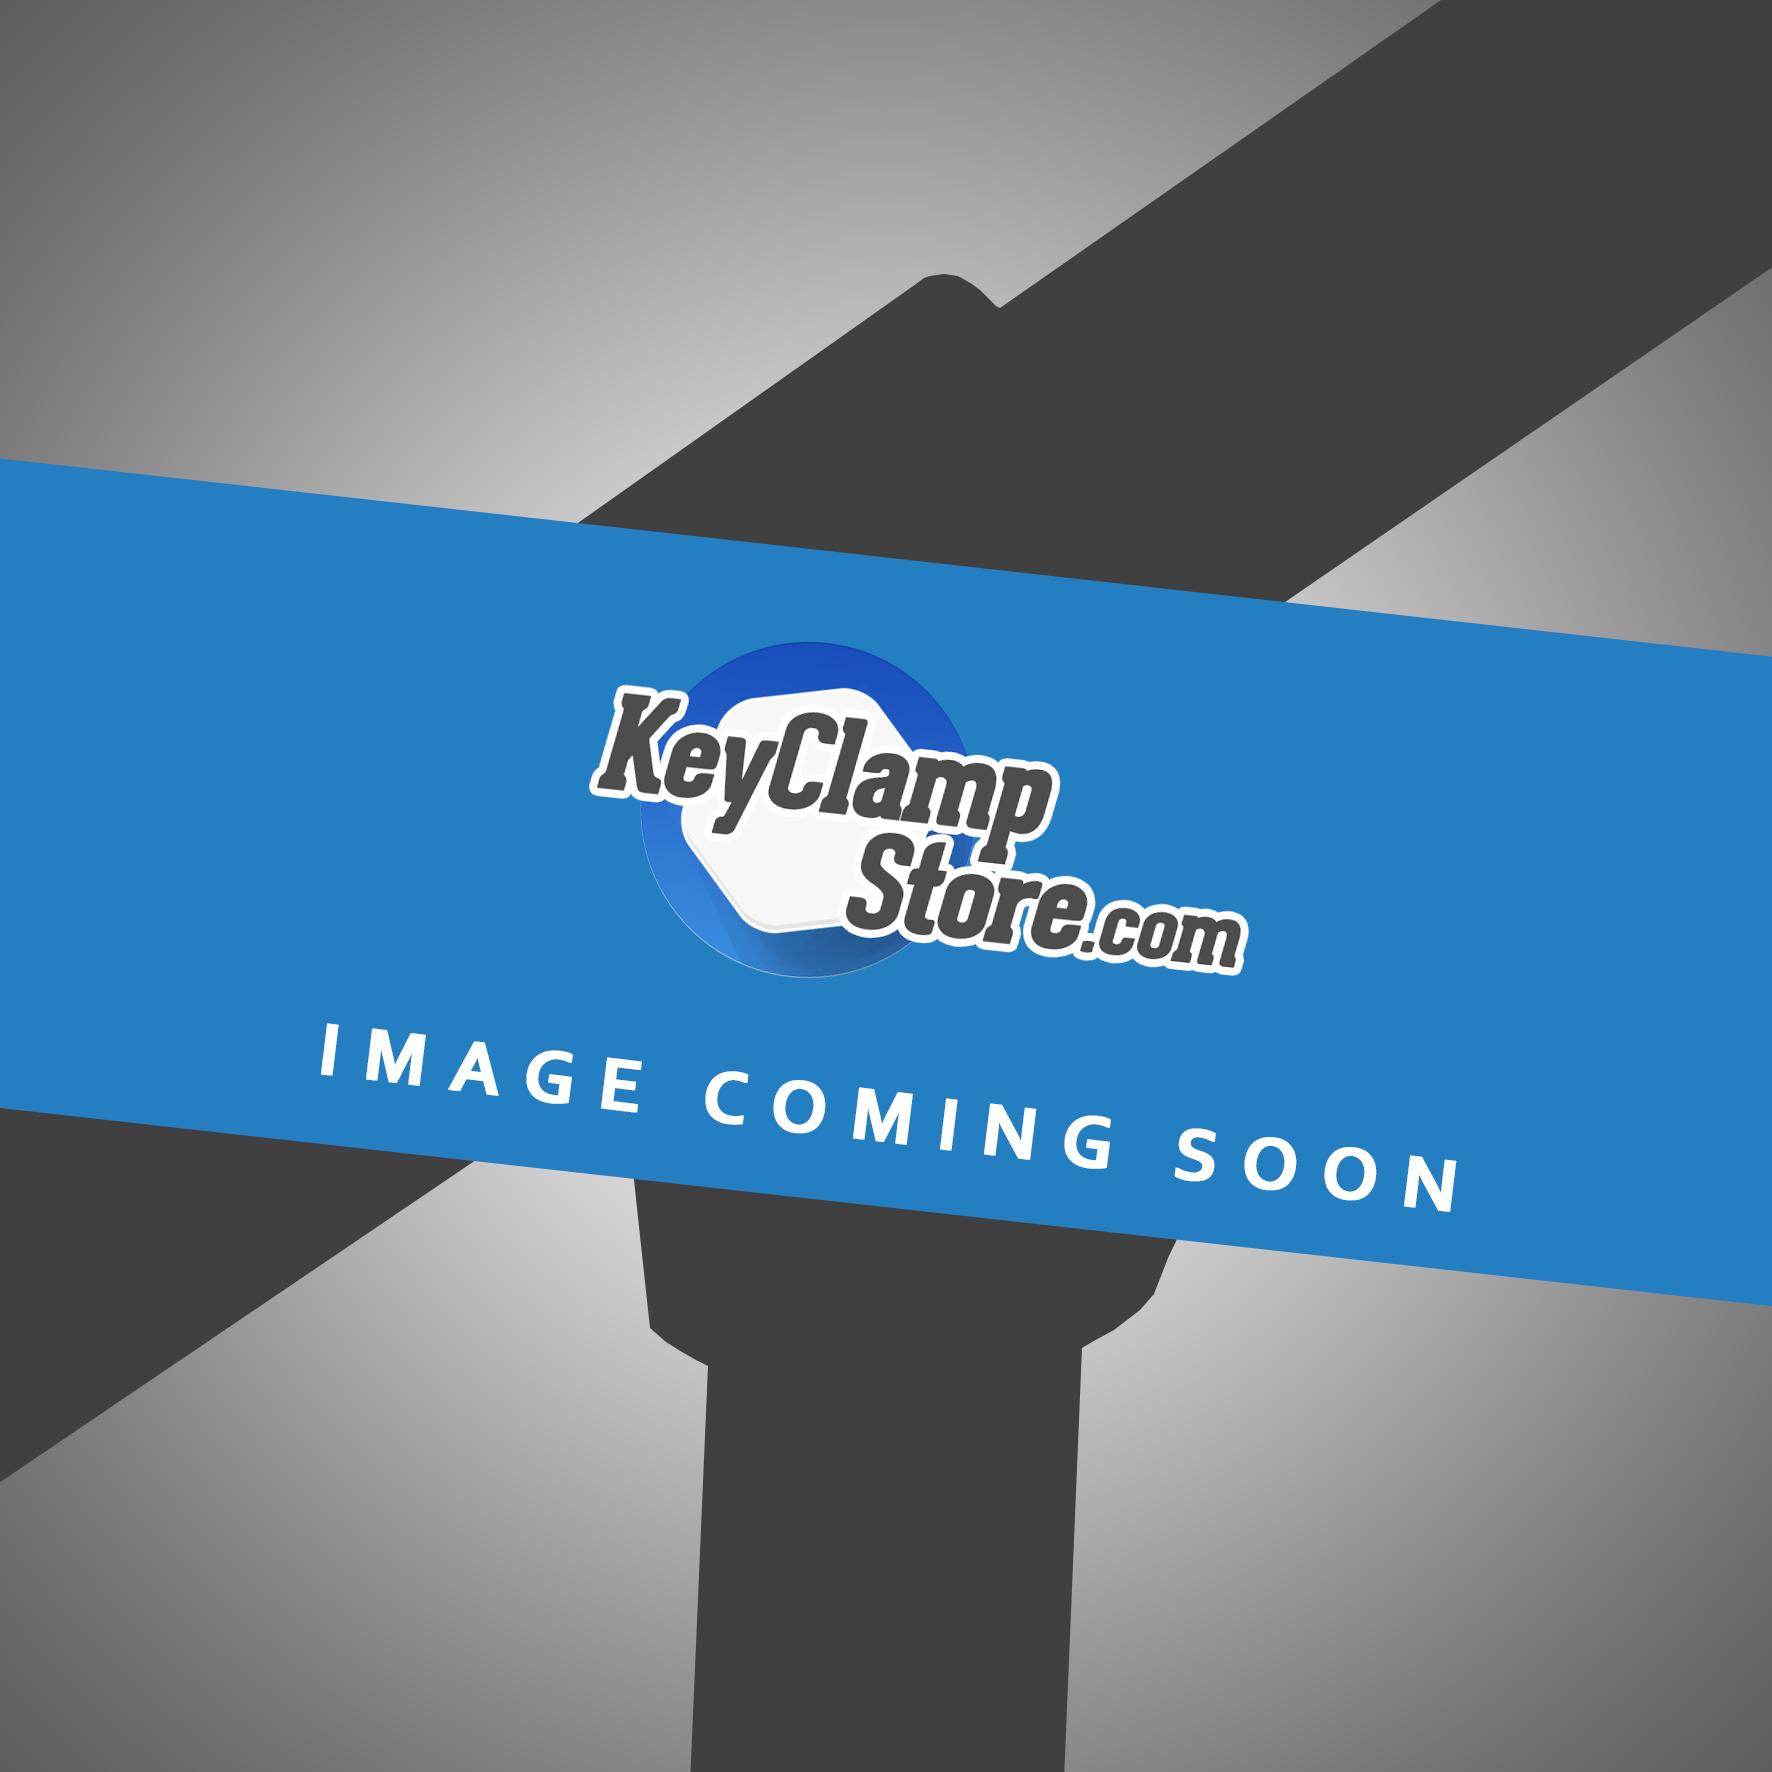 27mm PipeClamp Tubeclamp Key Clamp Tubing